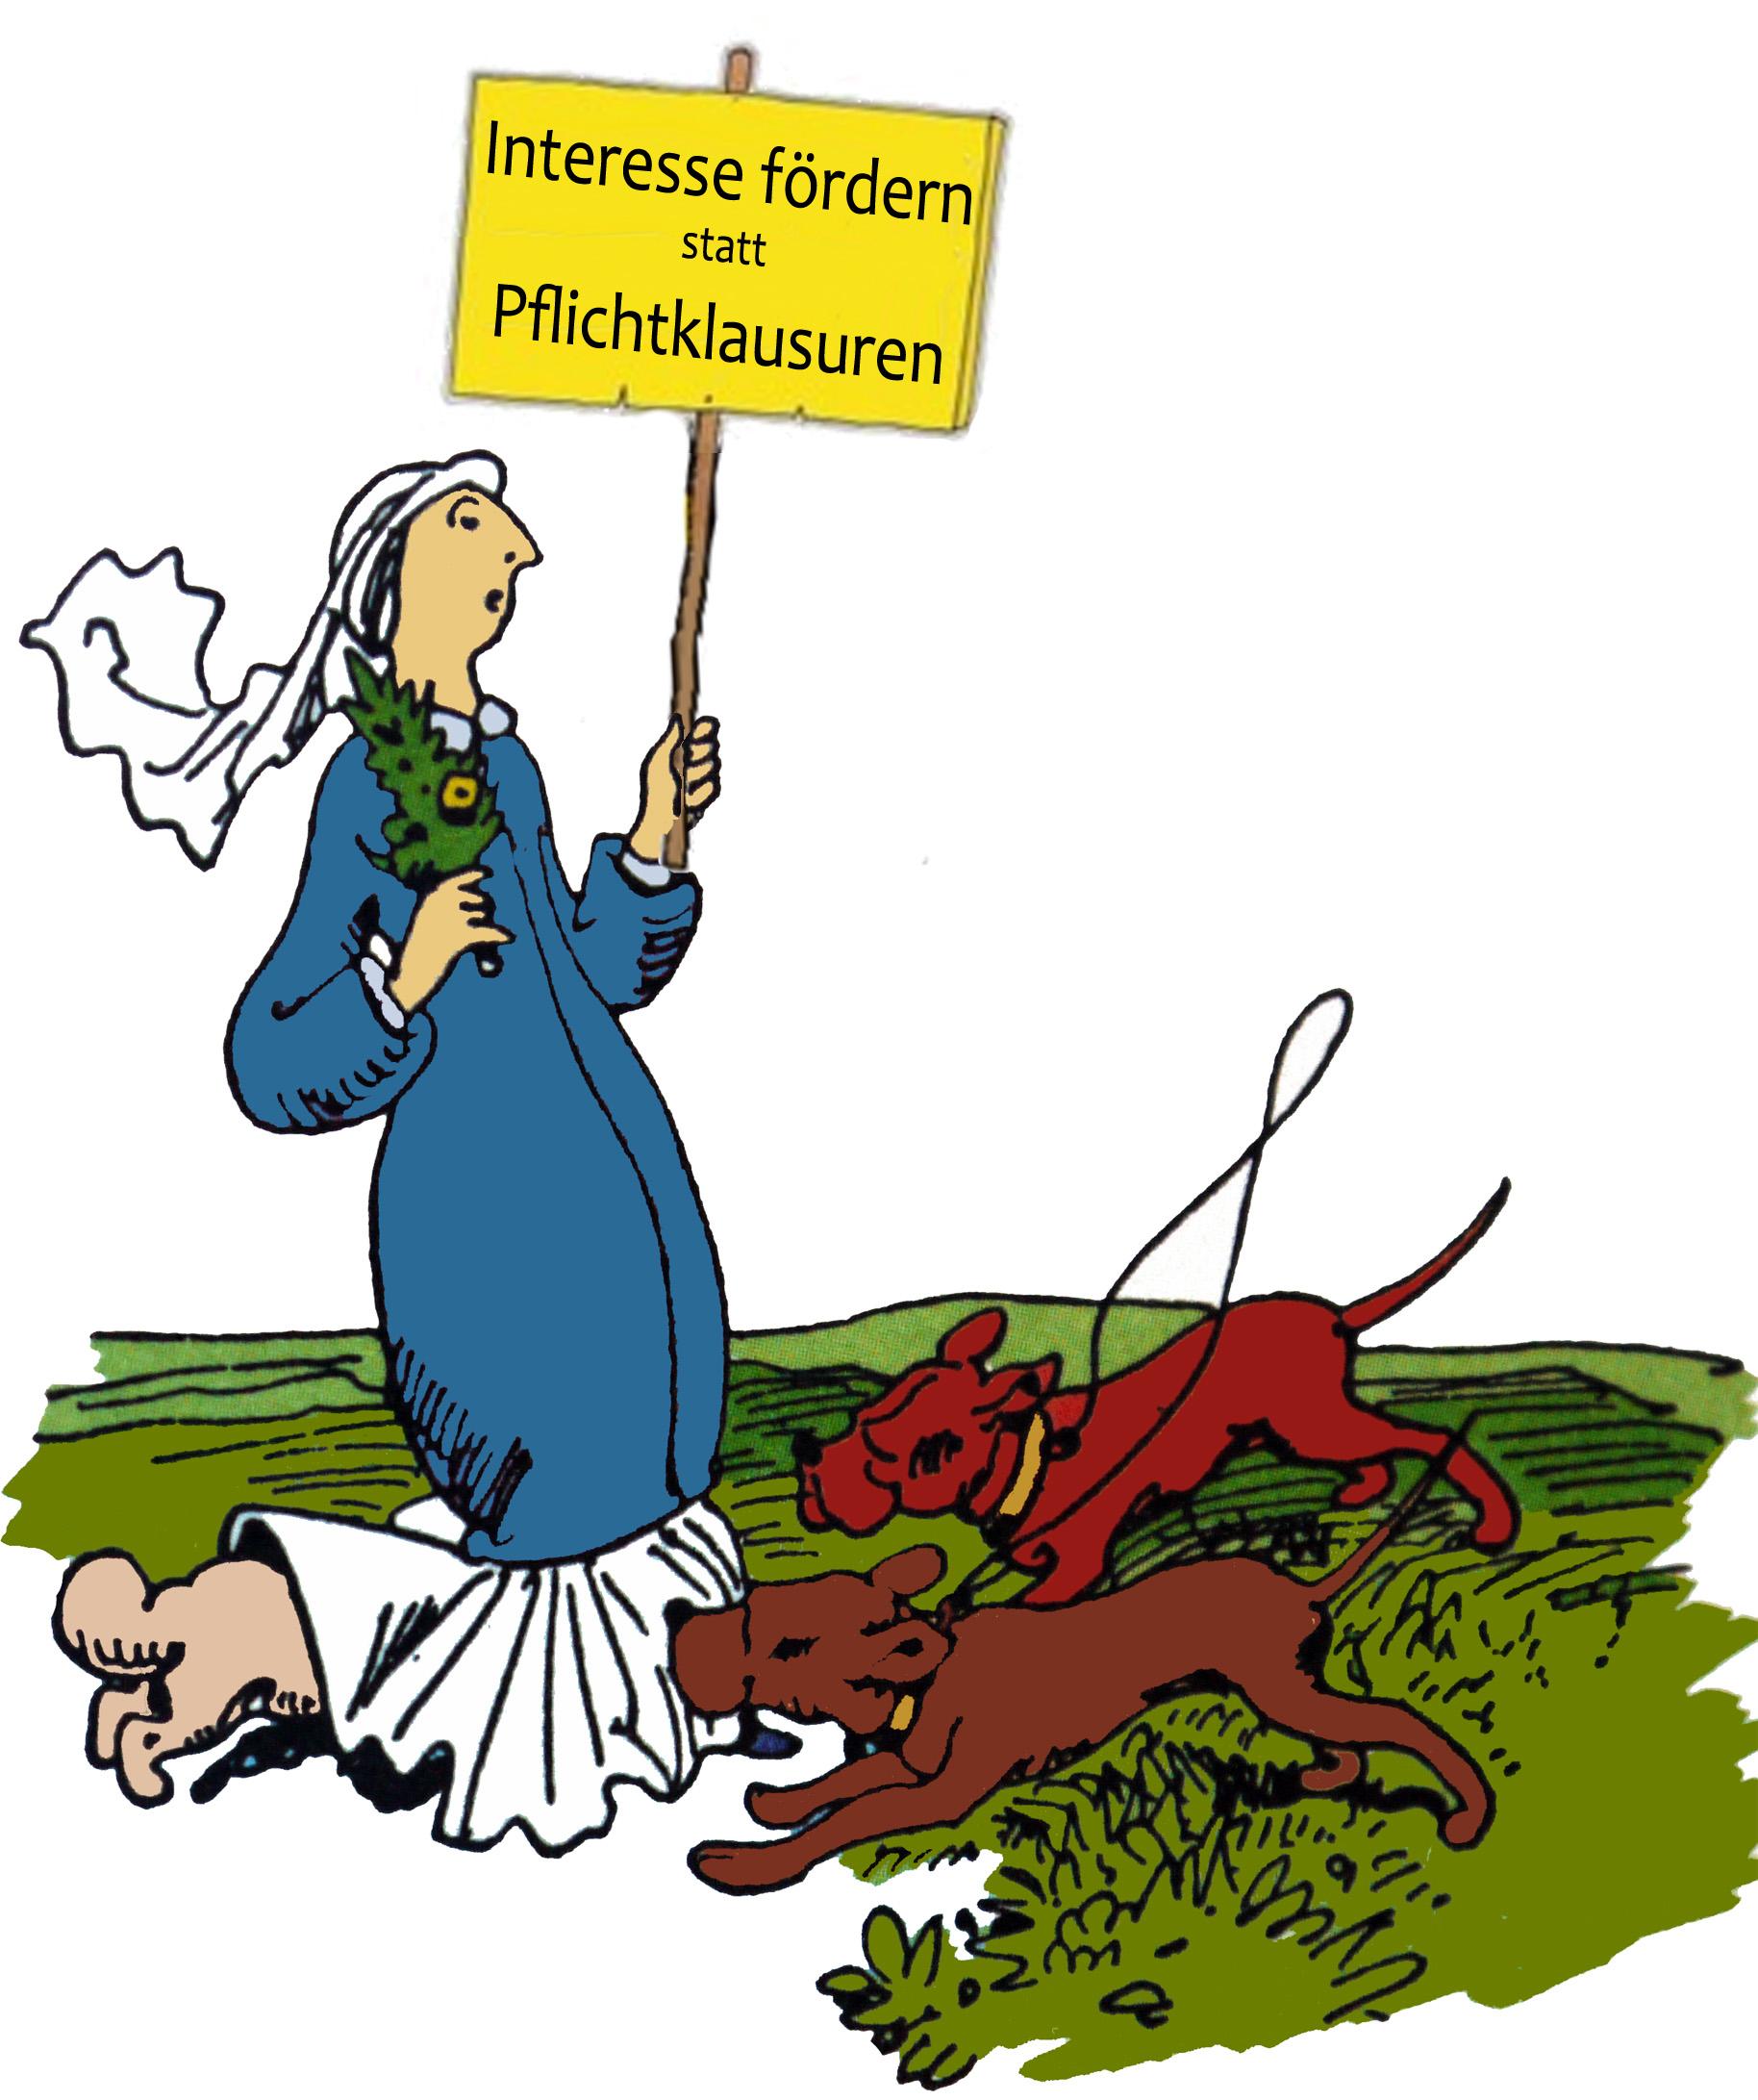 02. Madame protestiert - Interessenförderung